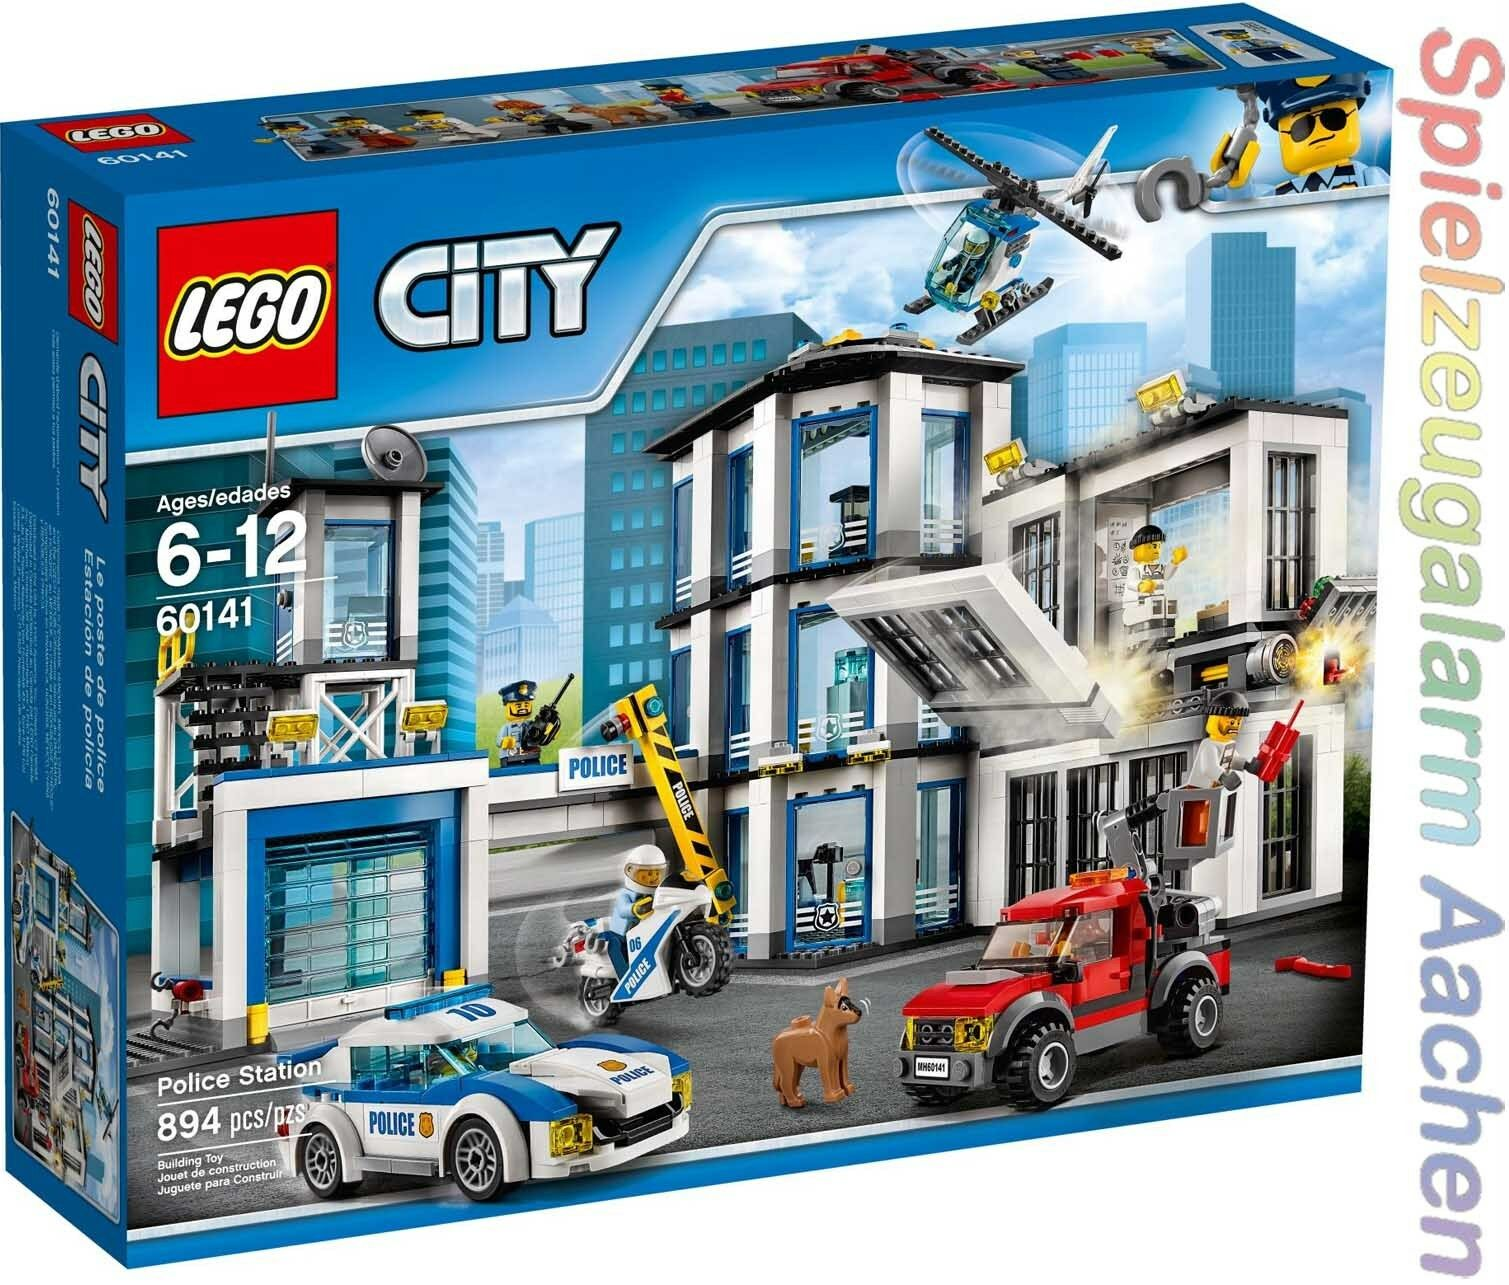 LEGO 60141 City Polizei Polizeiwache Police Station Le commissariat Neu  N1 17